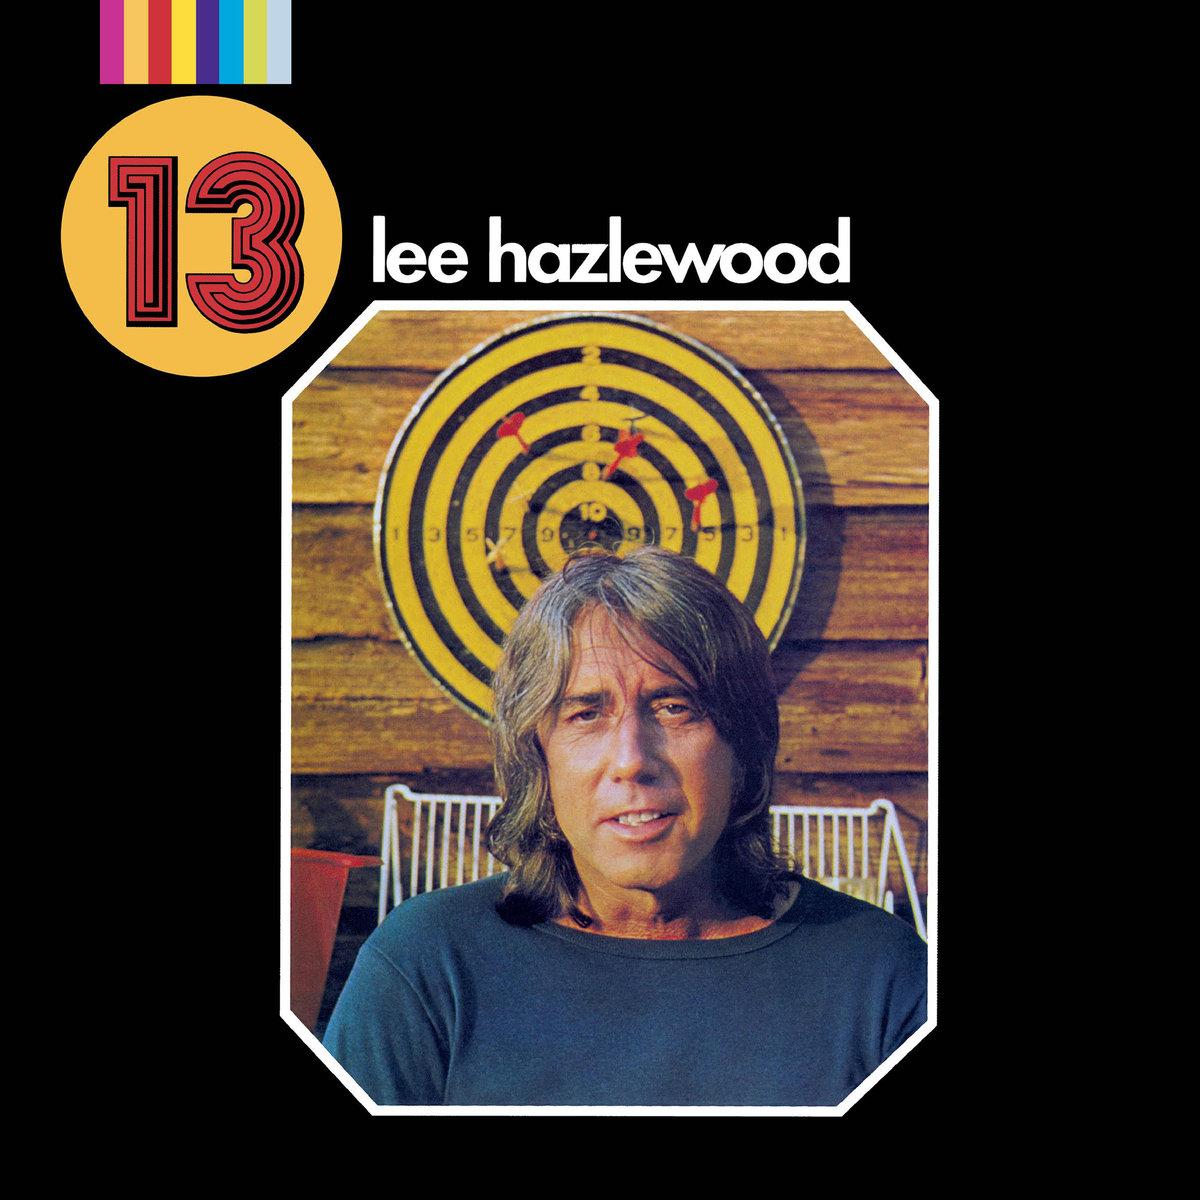 Lee Hazlewood Quot 13 Quot 1972 Music Is My Sanctuary